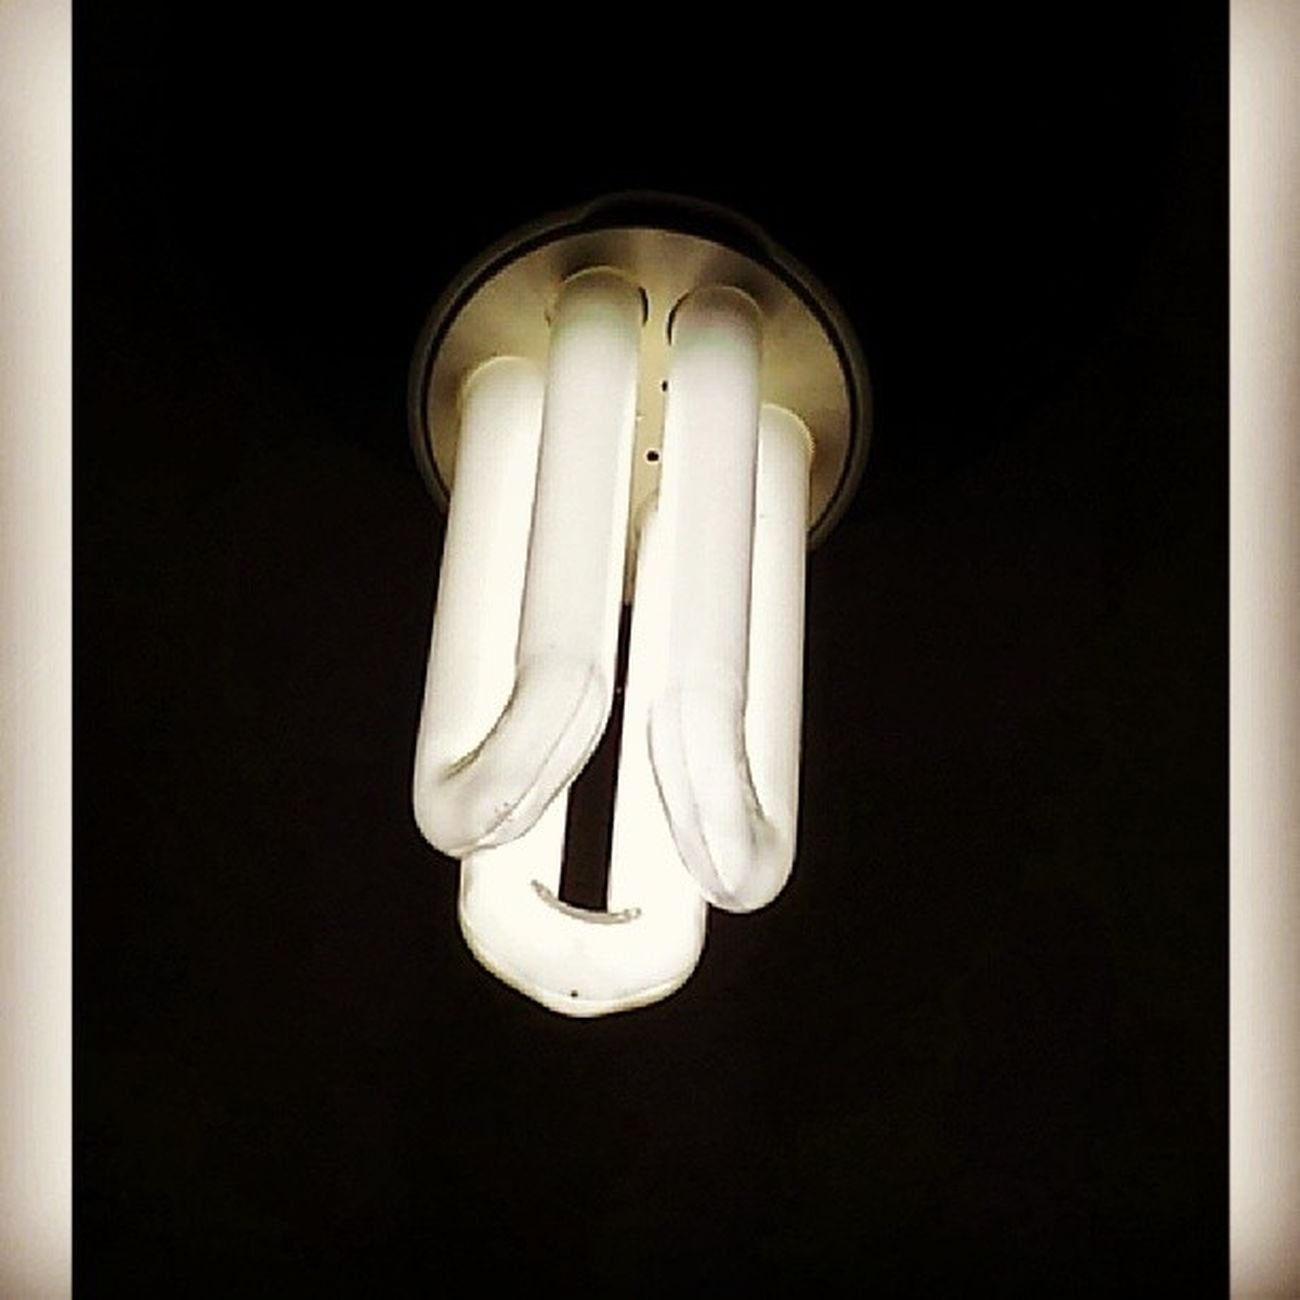 Lightbulb Bedroomlight Lightology Cfl Light bulb macro @lightology_highlight